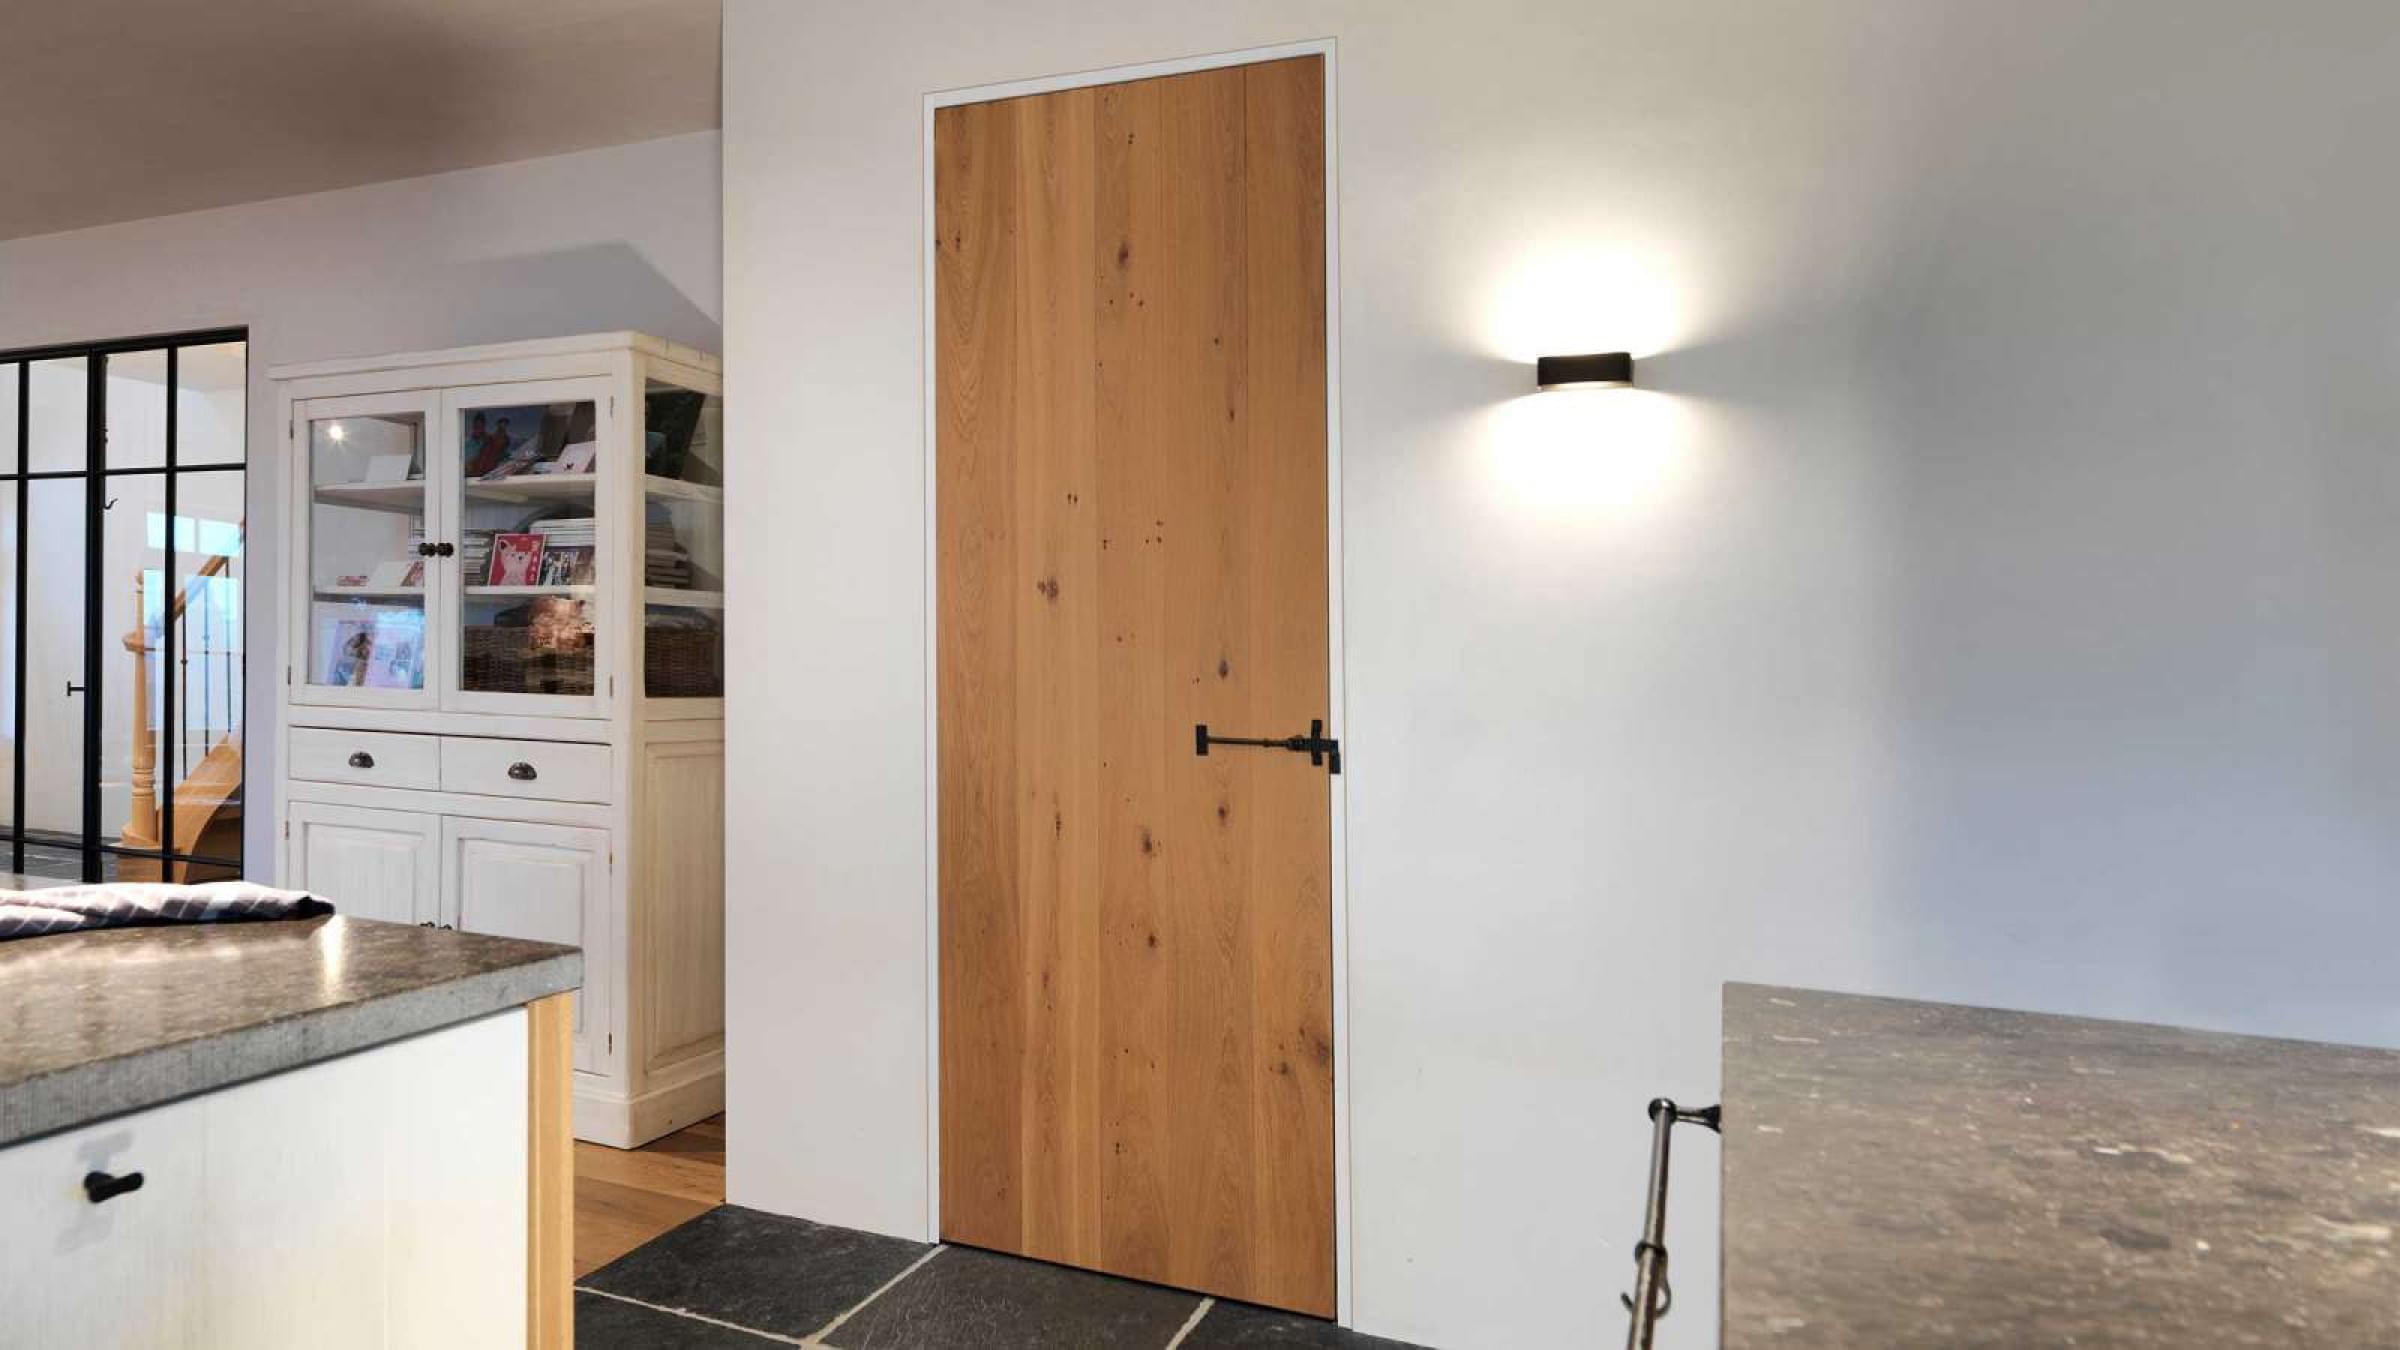 nordex-retro-deur-vgbri.ri-2400